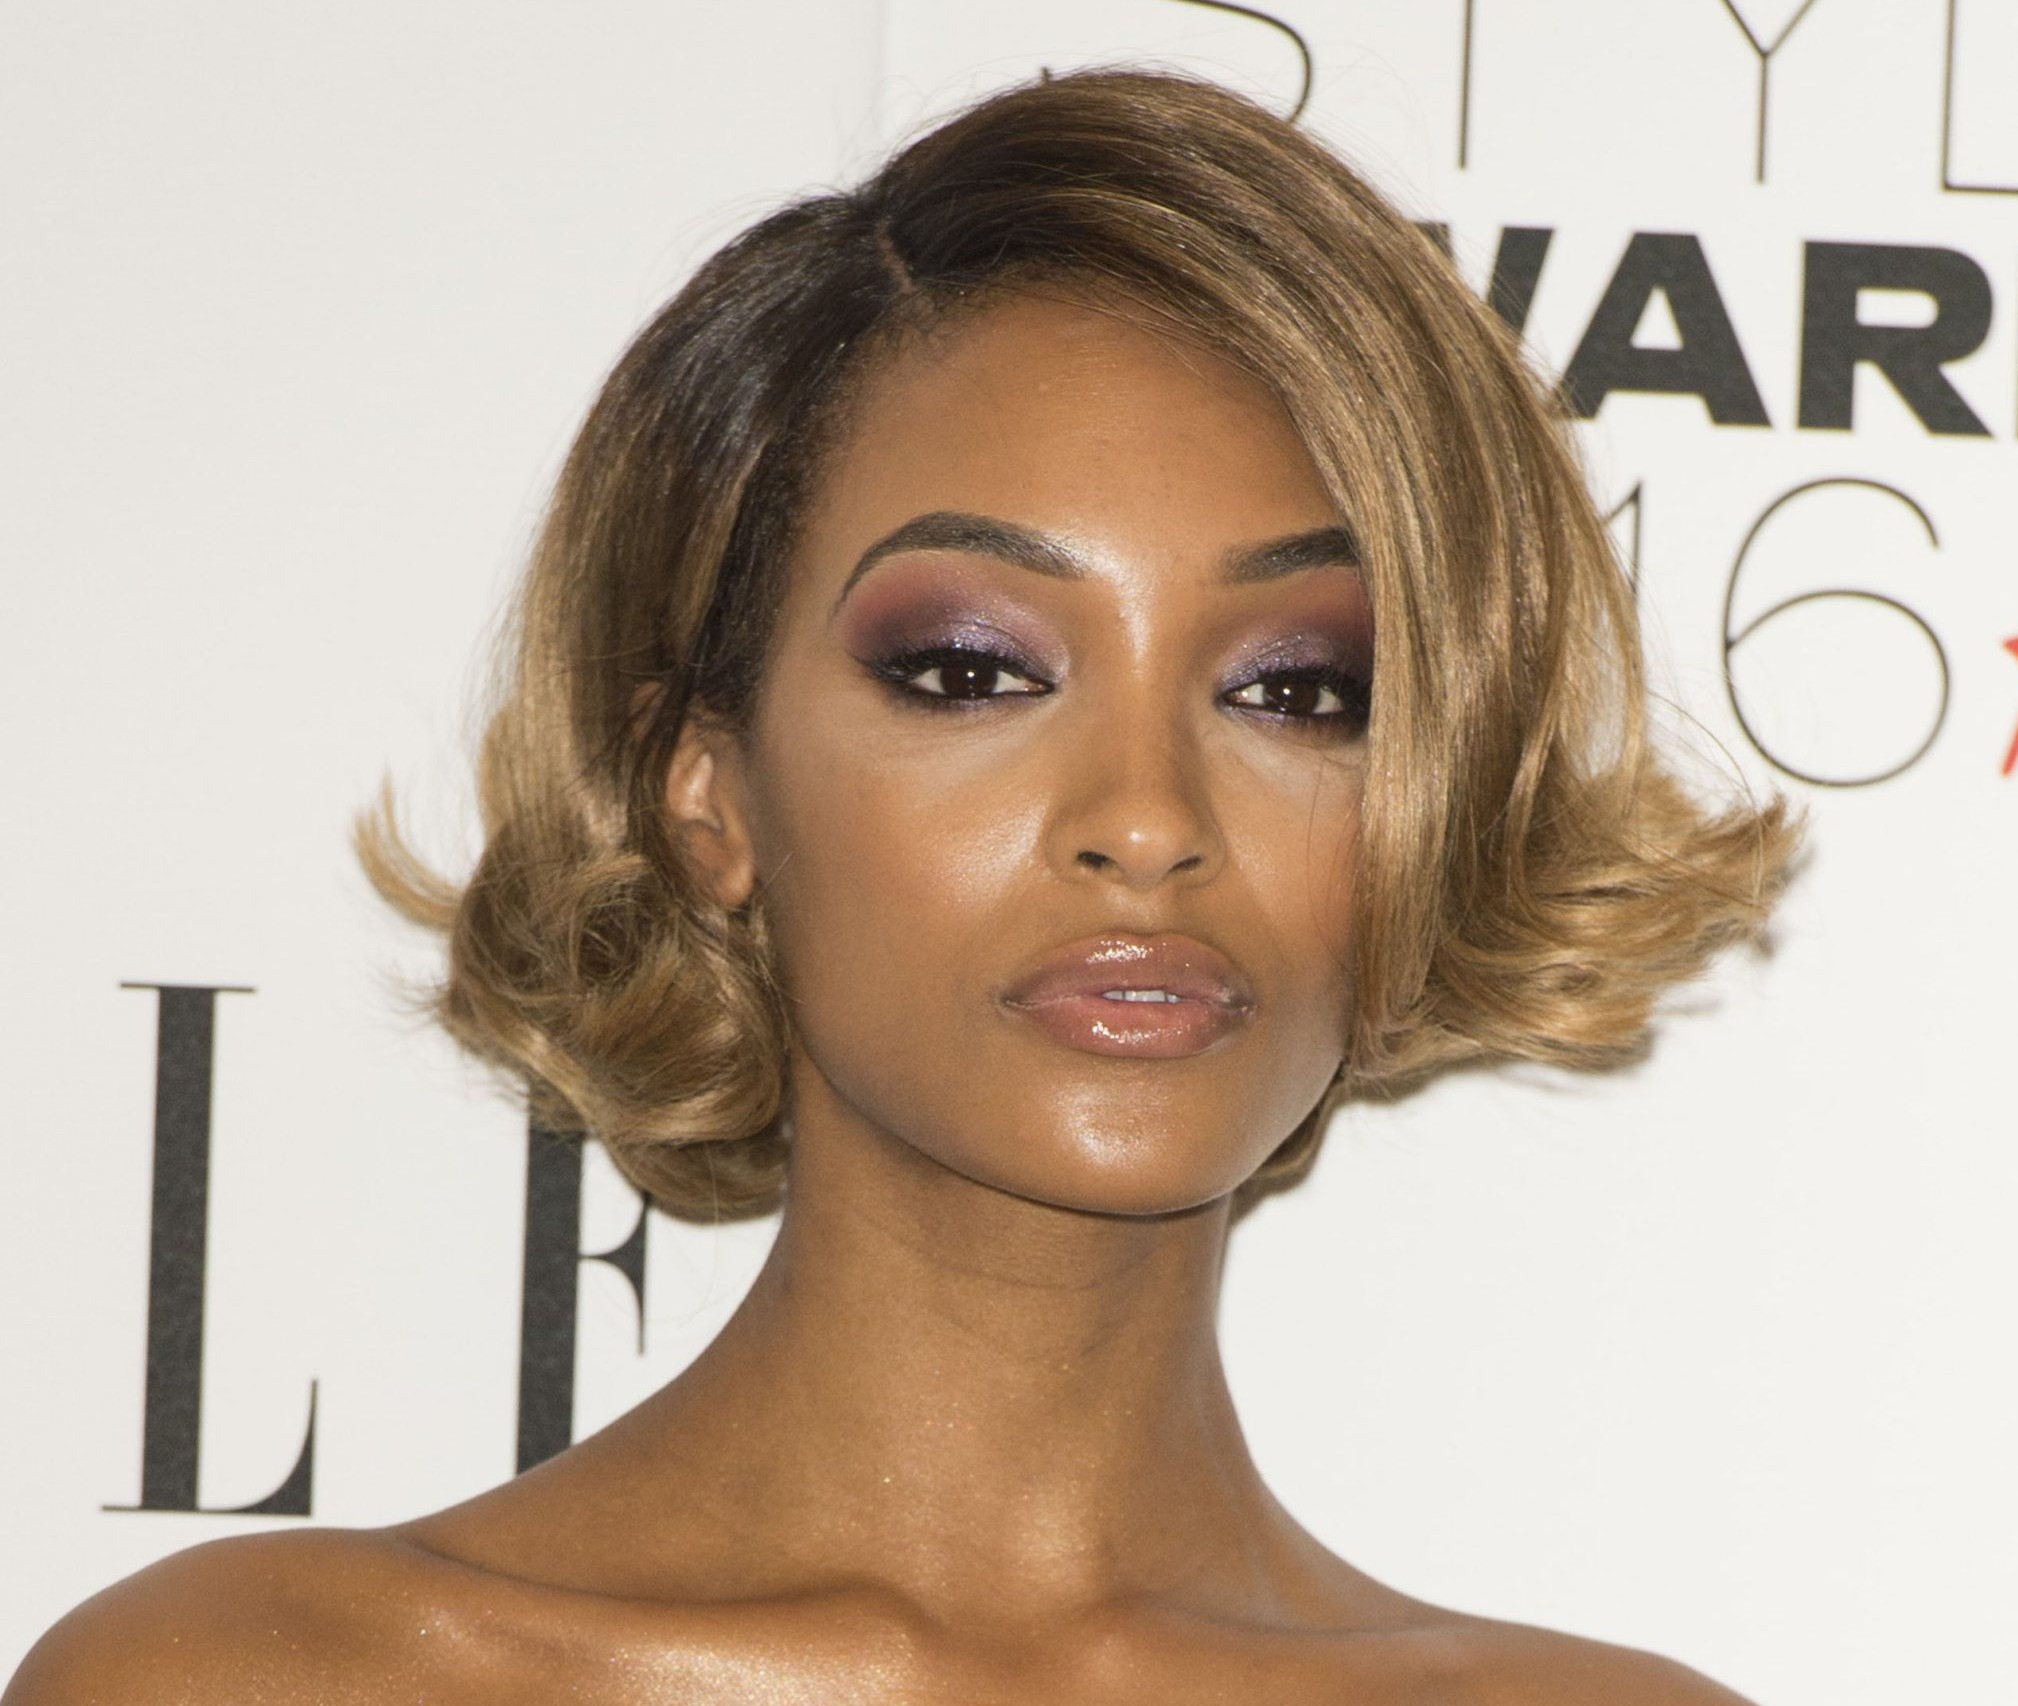 Catwalk darling Jourdan Dunn slams the lack of diversity in the fashion industry